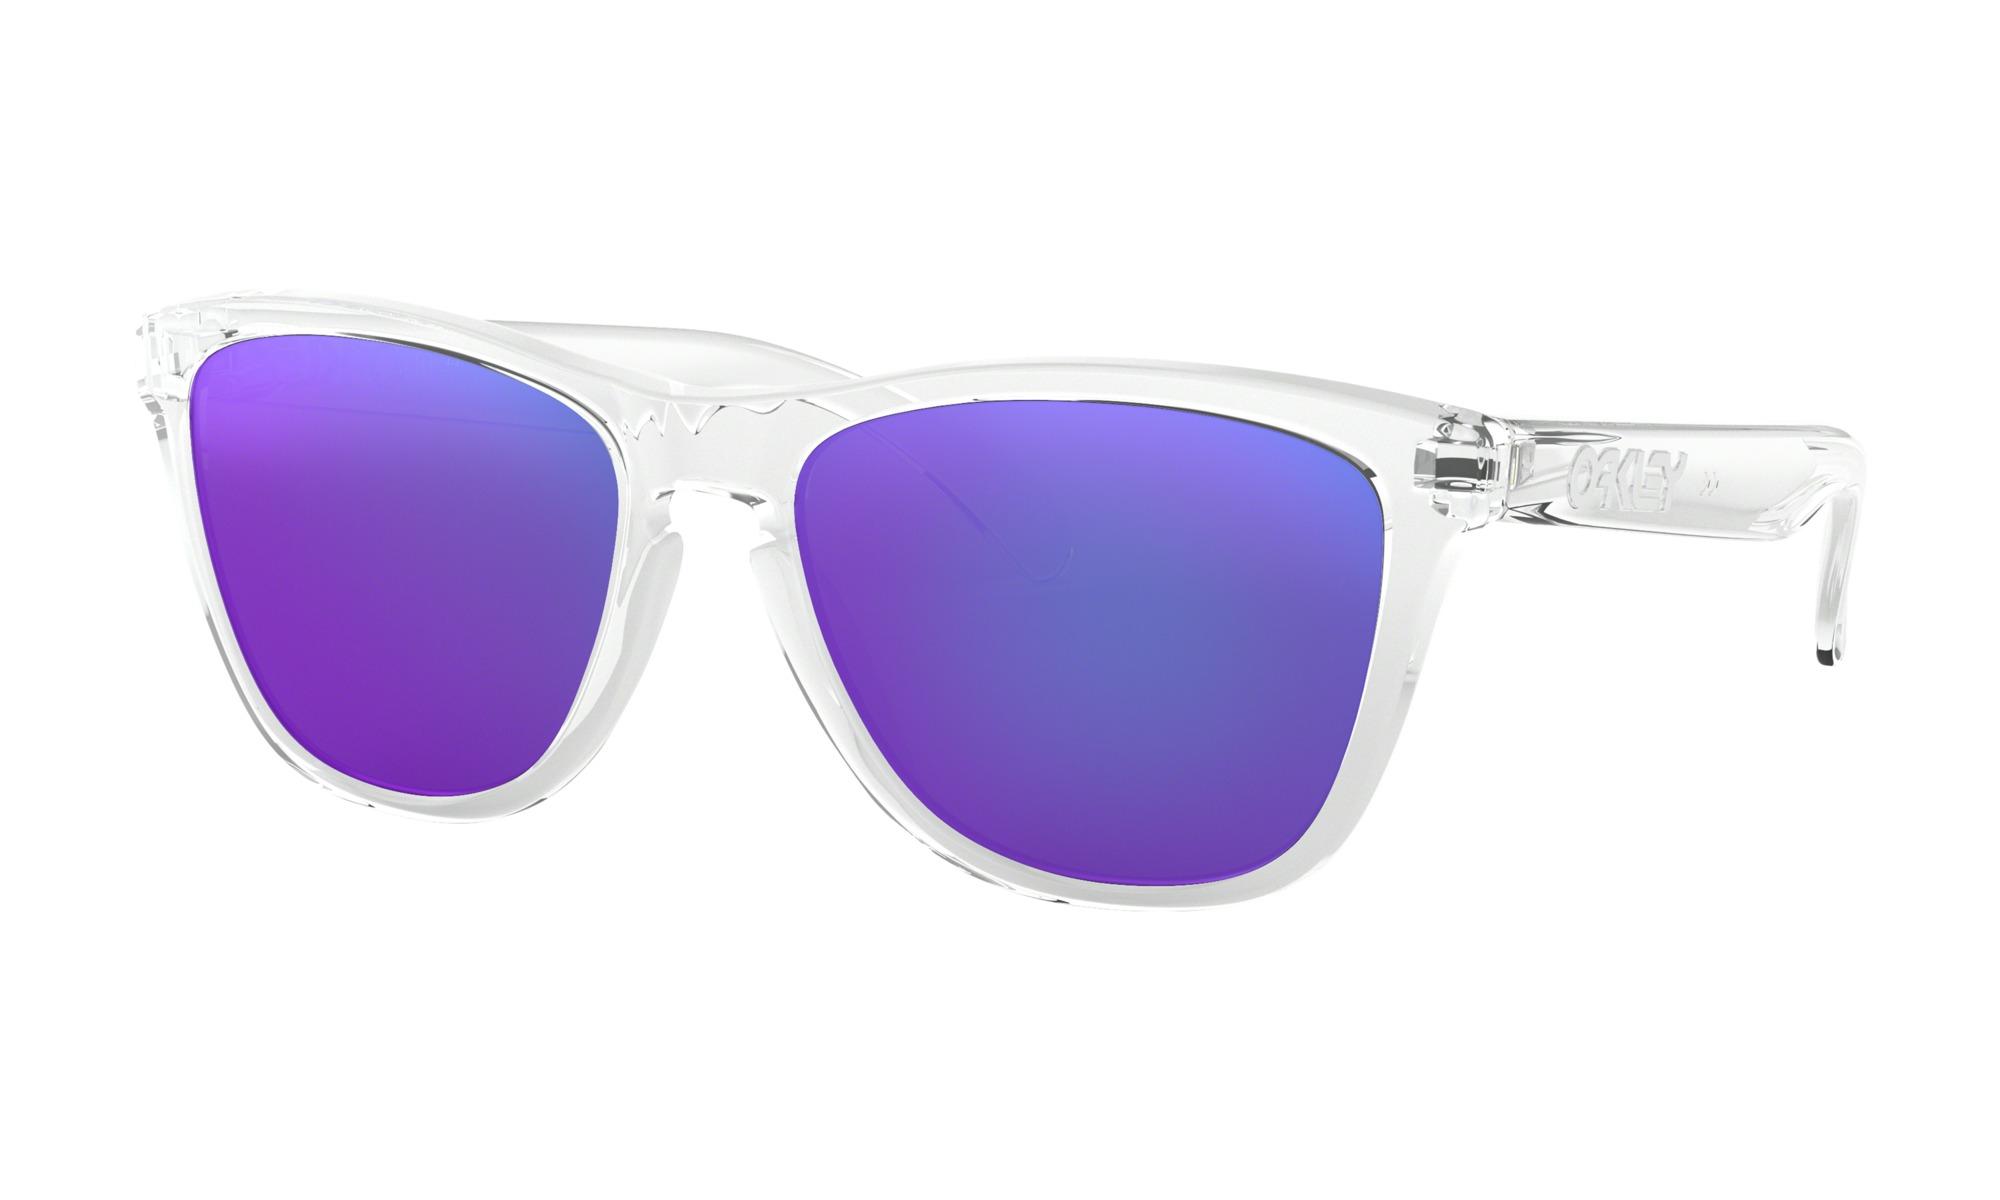 f9c03fbc23b3 Oakley Frogskins Sunglasses – Polished Clear with Violet Iridium Lens